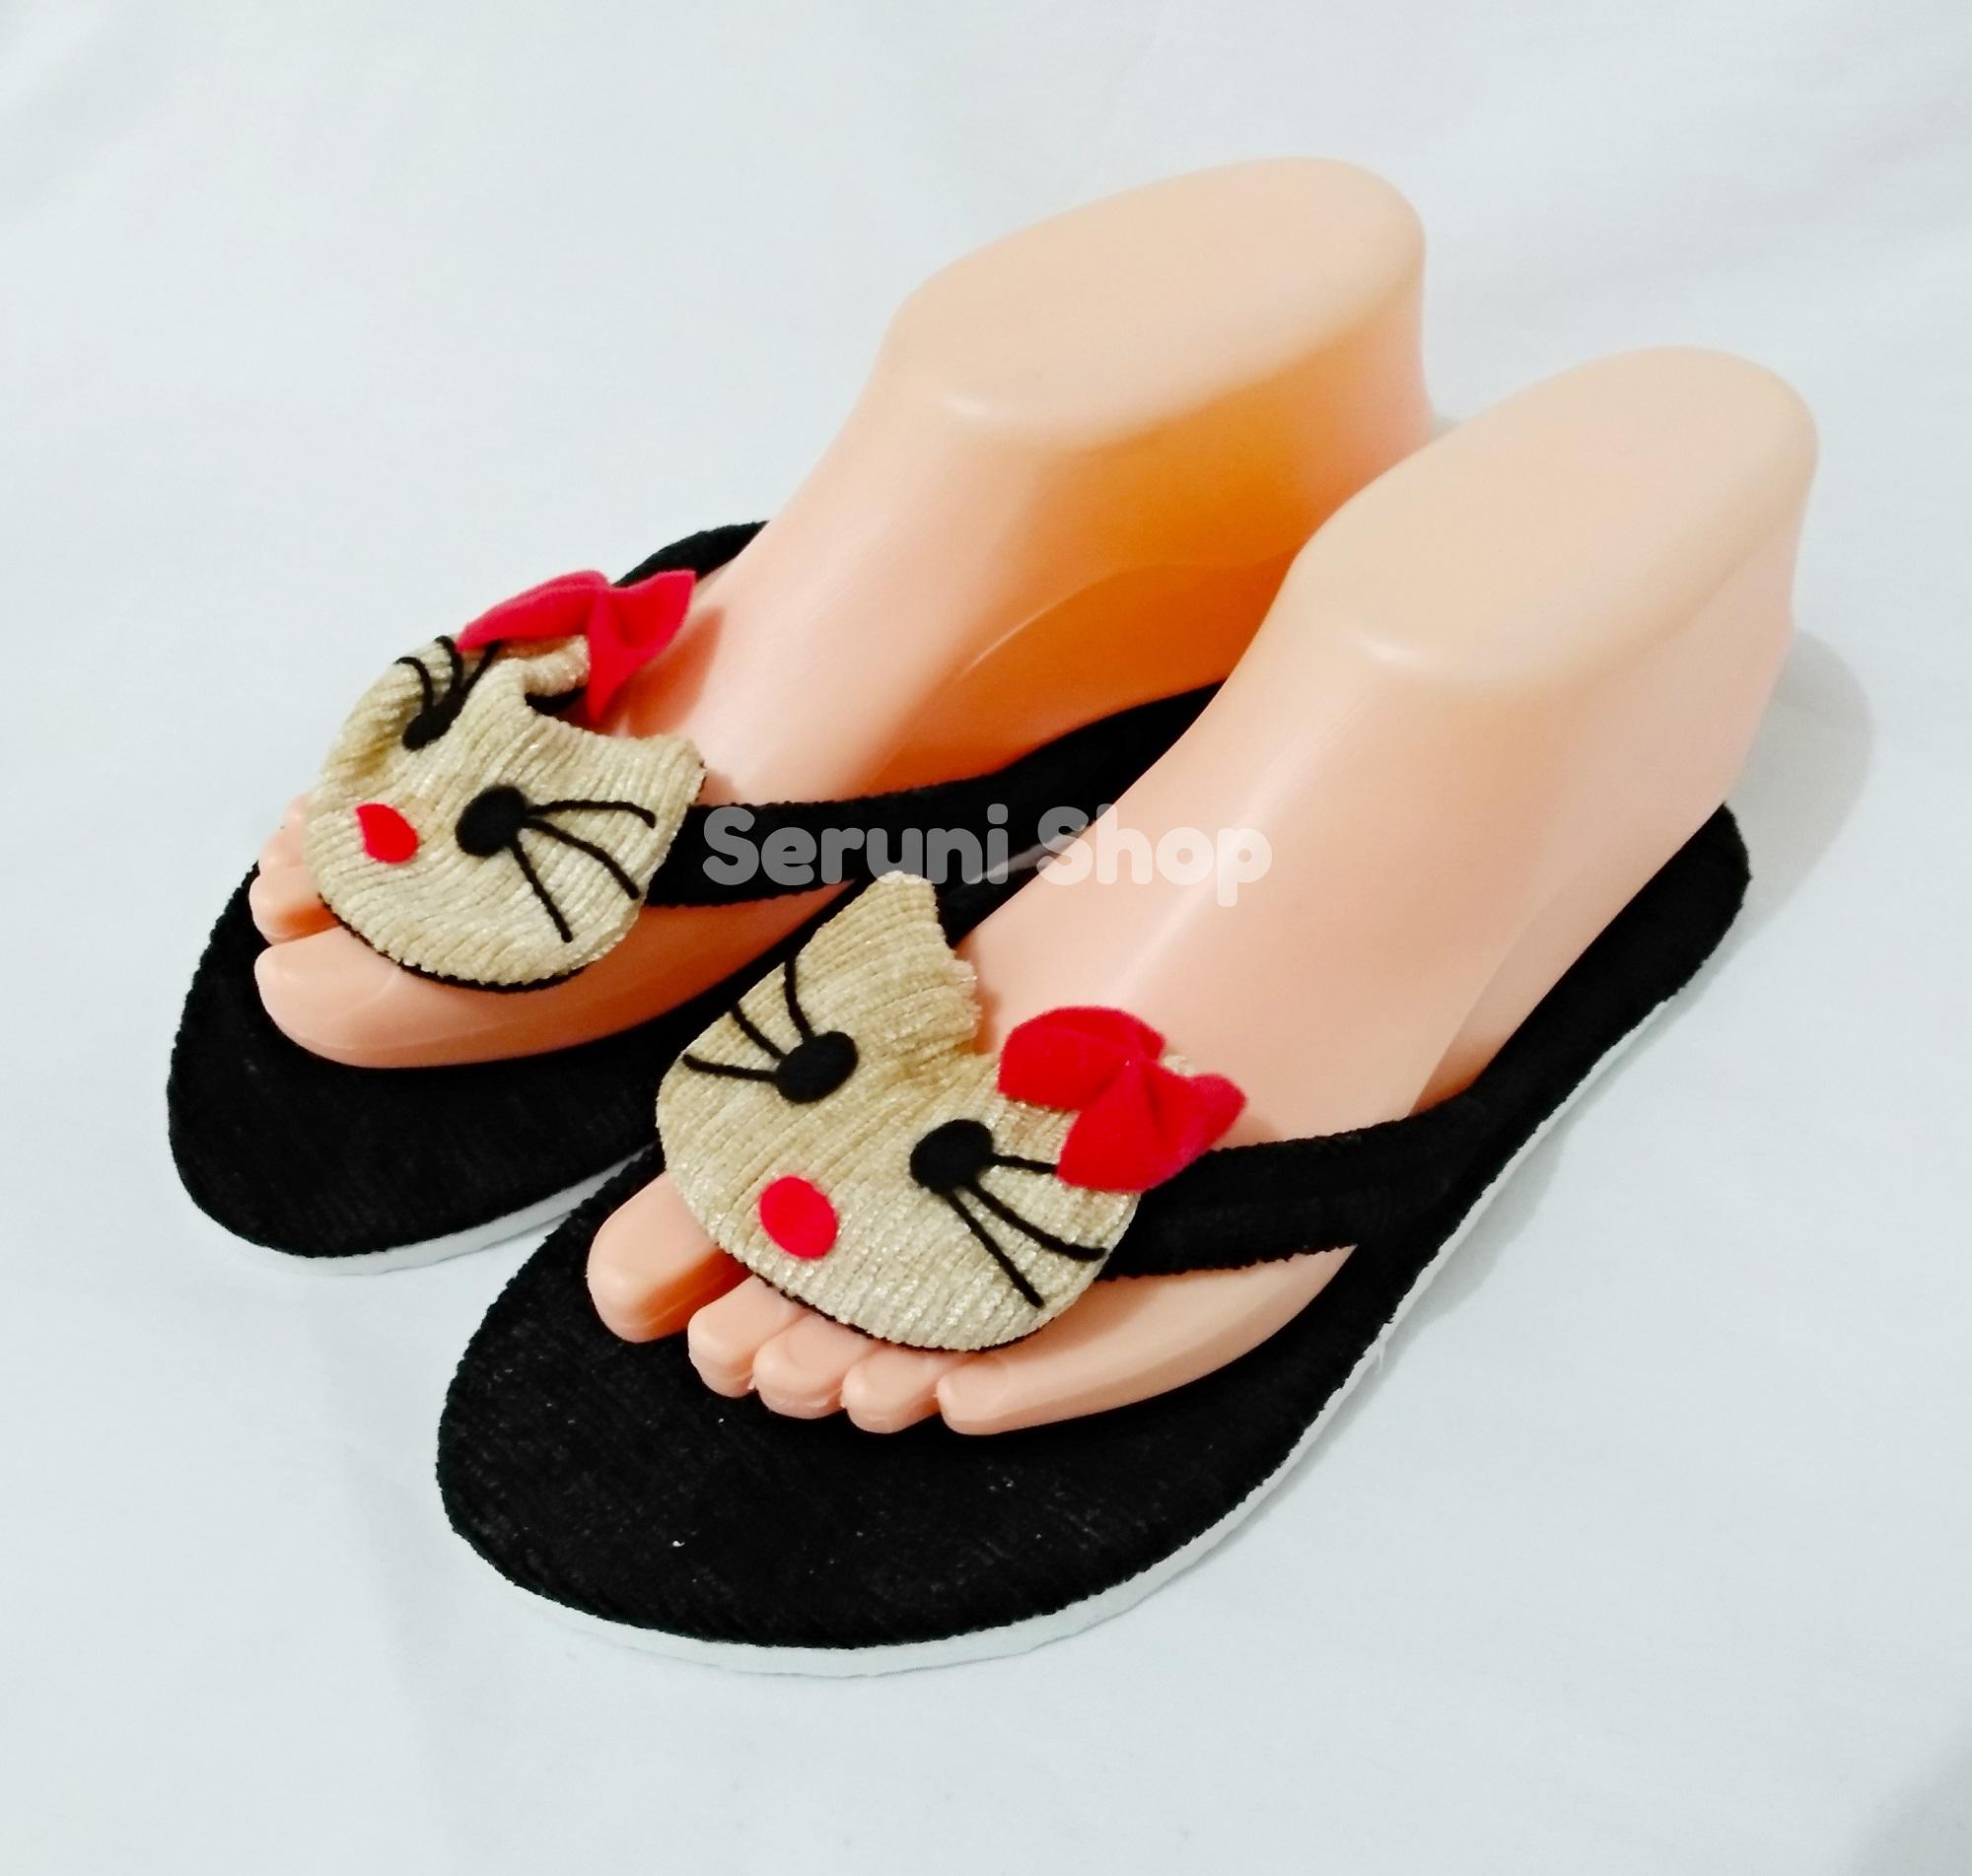 Jual Rak Sepatu Gantung Karakter 9 Tingkat Resleting Hello Seleting Sandal Santai Kitty Hitam